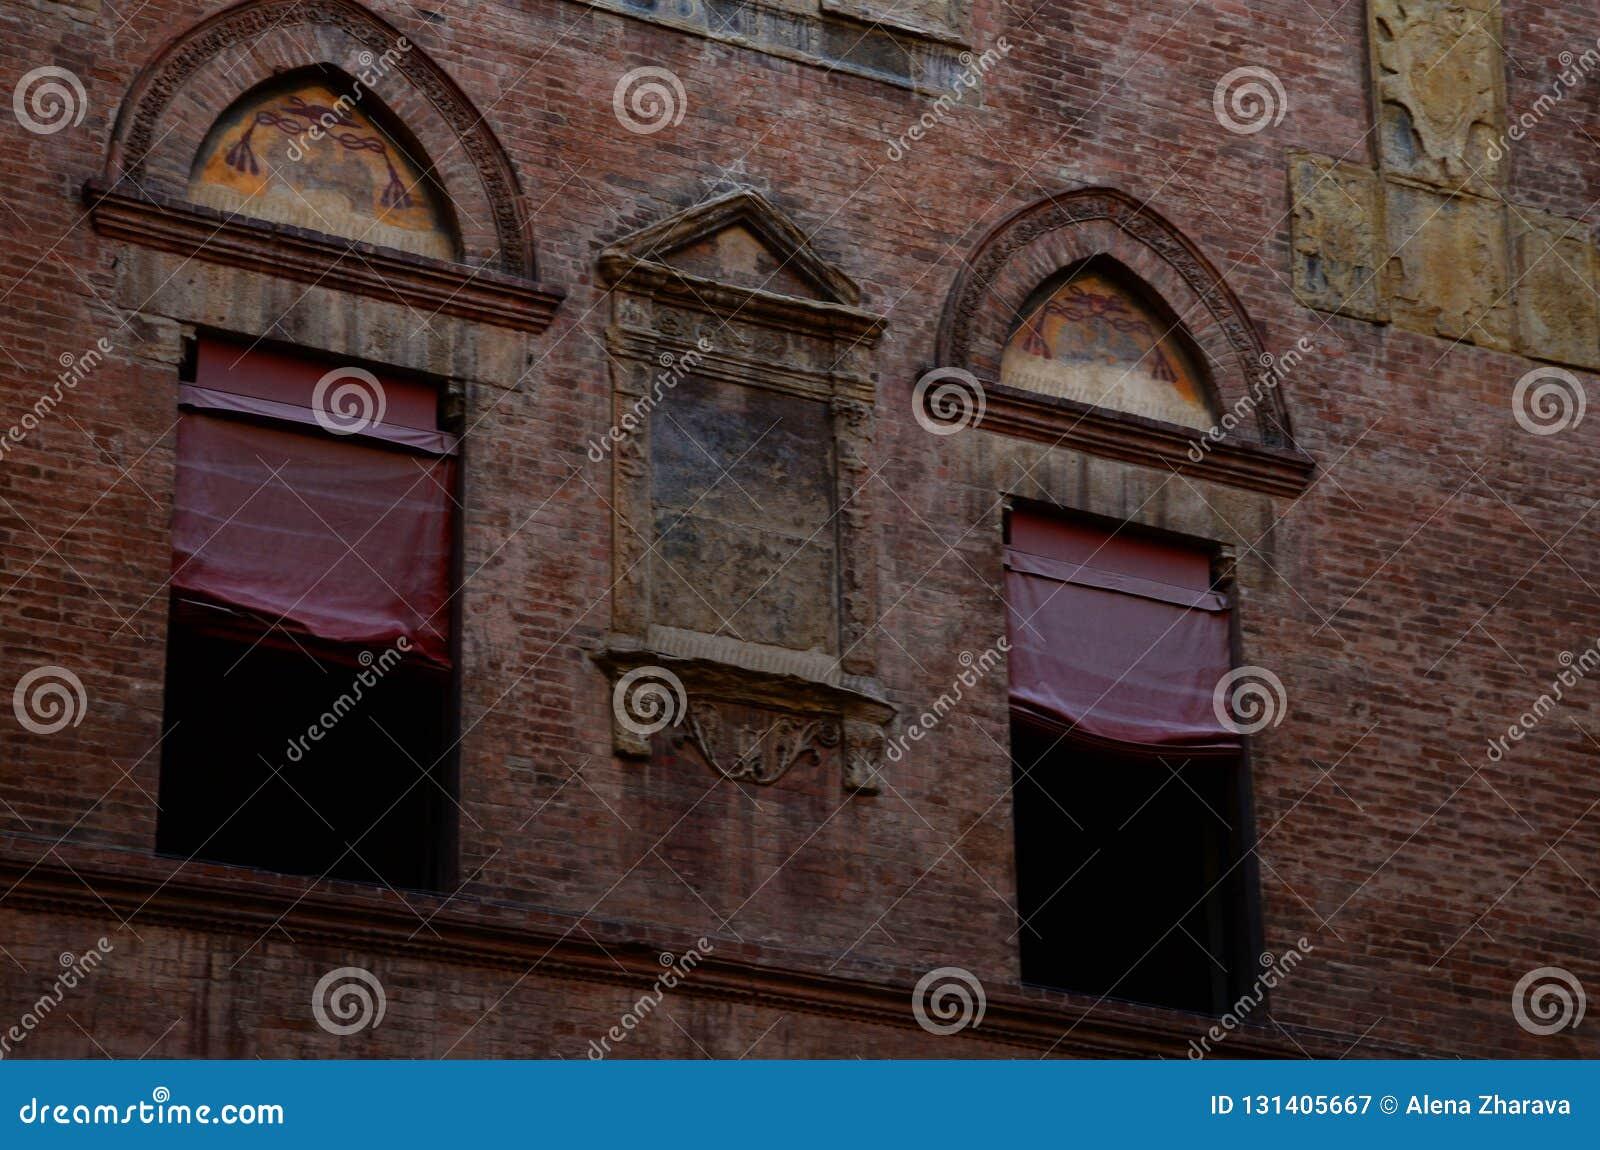 Stedelijke architectuur in het stadscentrum, Bologna, Italië